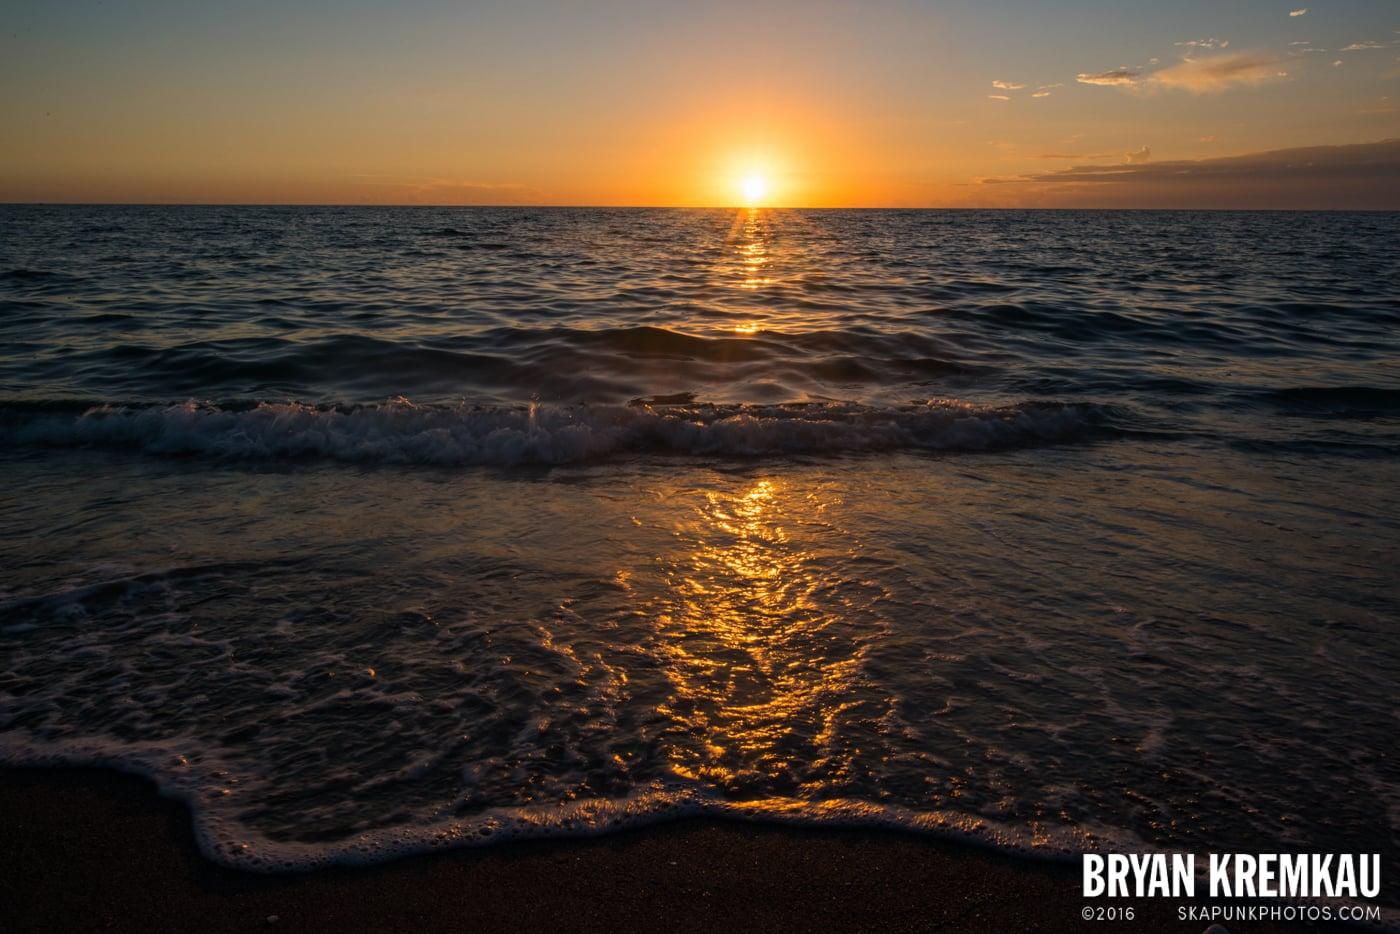 Sunsets, Astrophotography & Birds @ Venice, Florida - 10.25.14 - 11.5.14 (118)